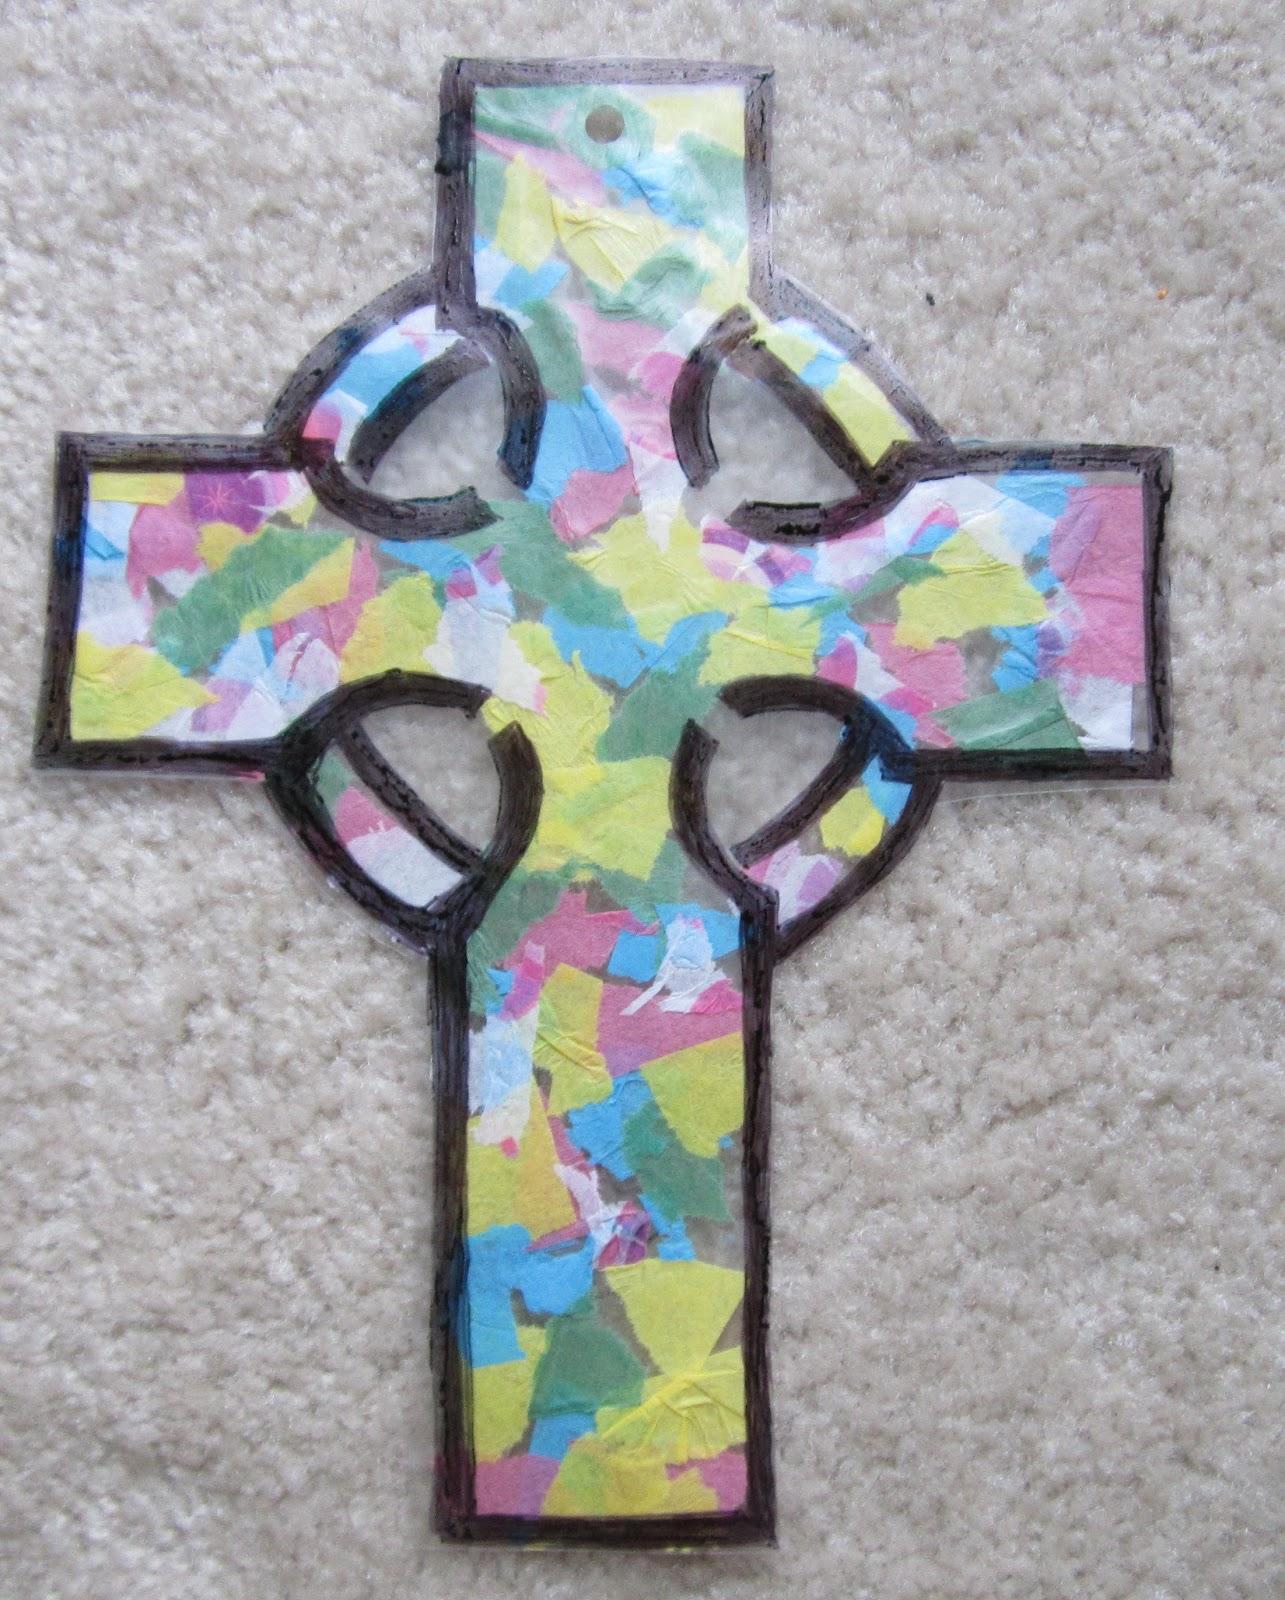 http://3.bp.blogspot.com/-v-YgFabtD7w/T3yidlZIyjI/AAAAAAAAAXM/lpg48FXOCqE/s1600/tissueCeltic+Cross1.jpg